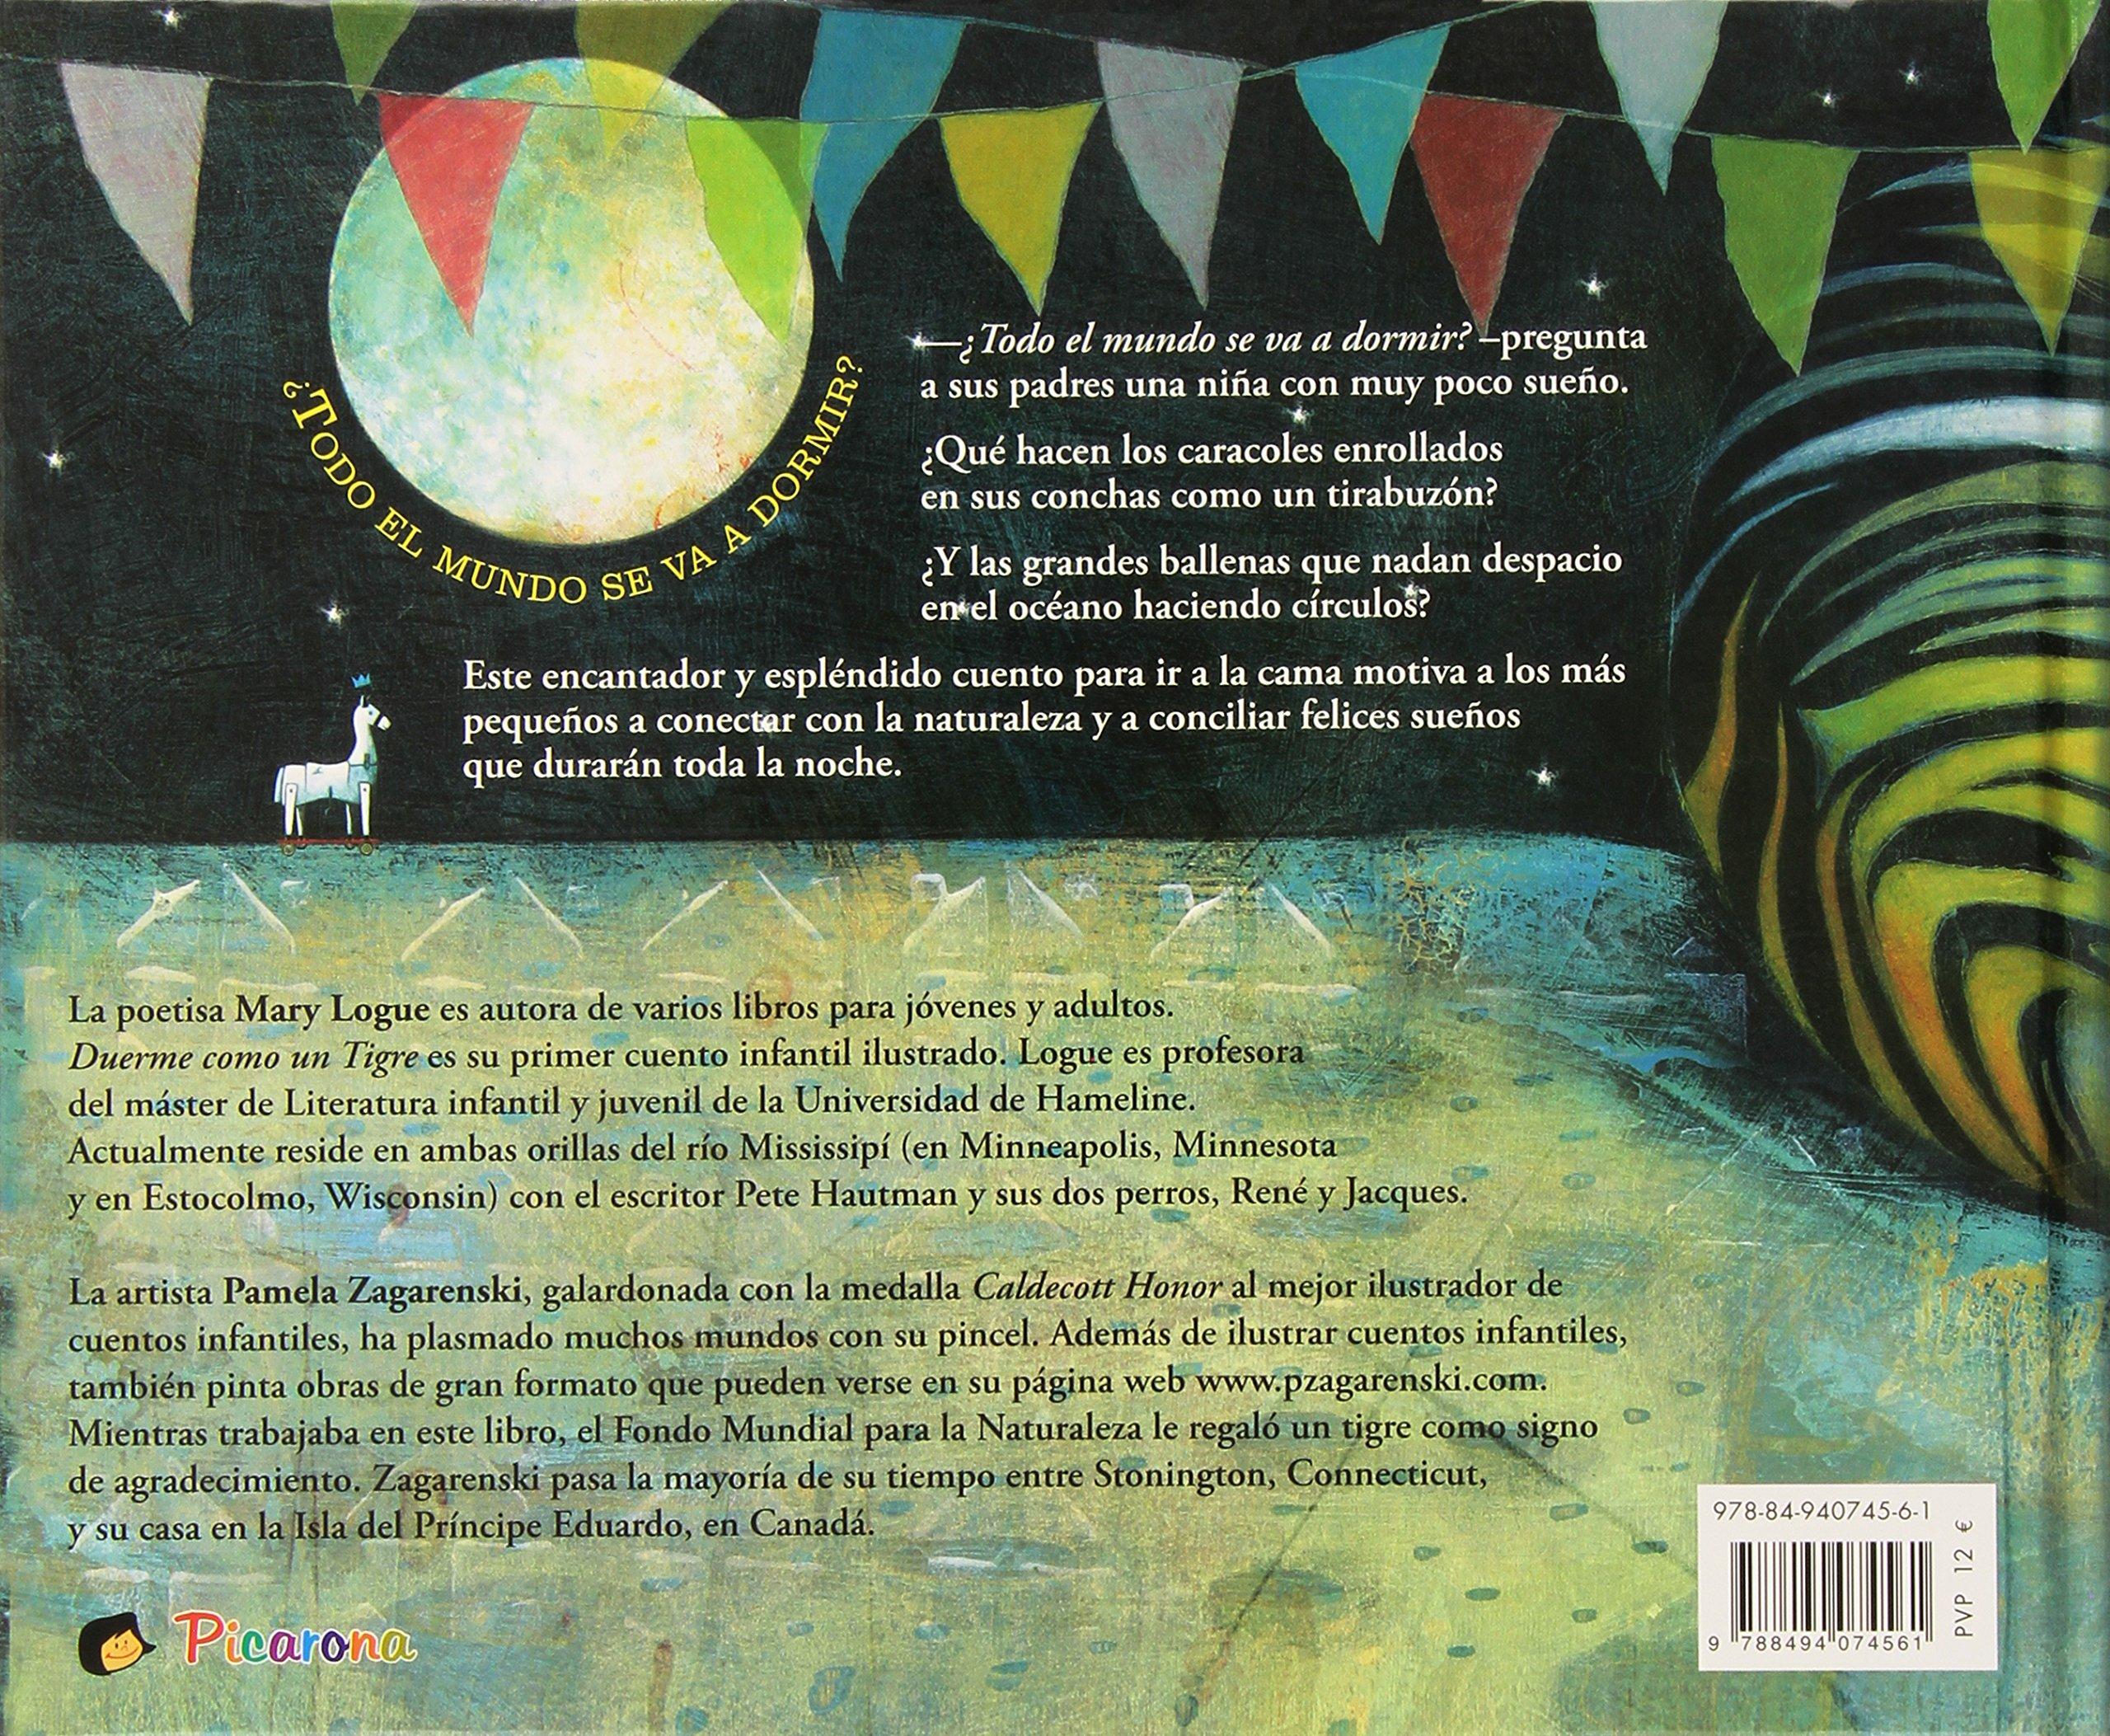 Duerme como un tigre (Spanish Edition): Pamela Zagarenski: 9788494074561: Amazon.com: Books